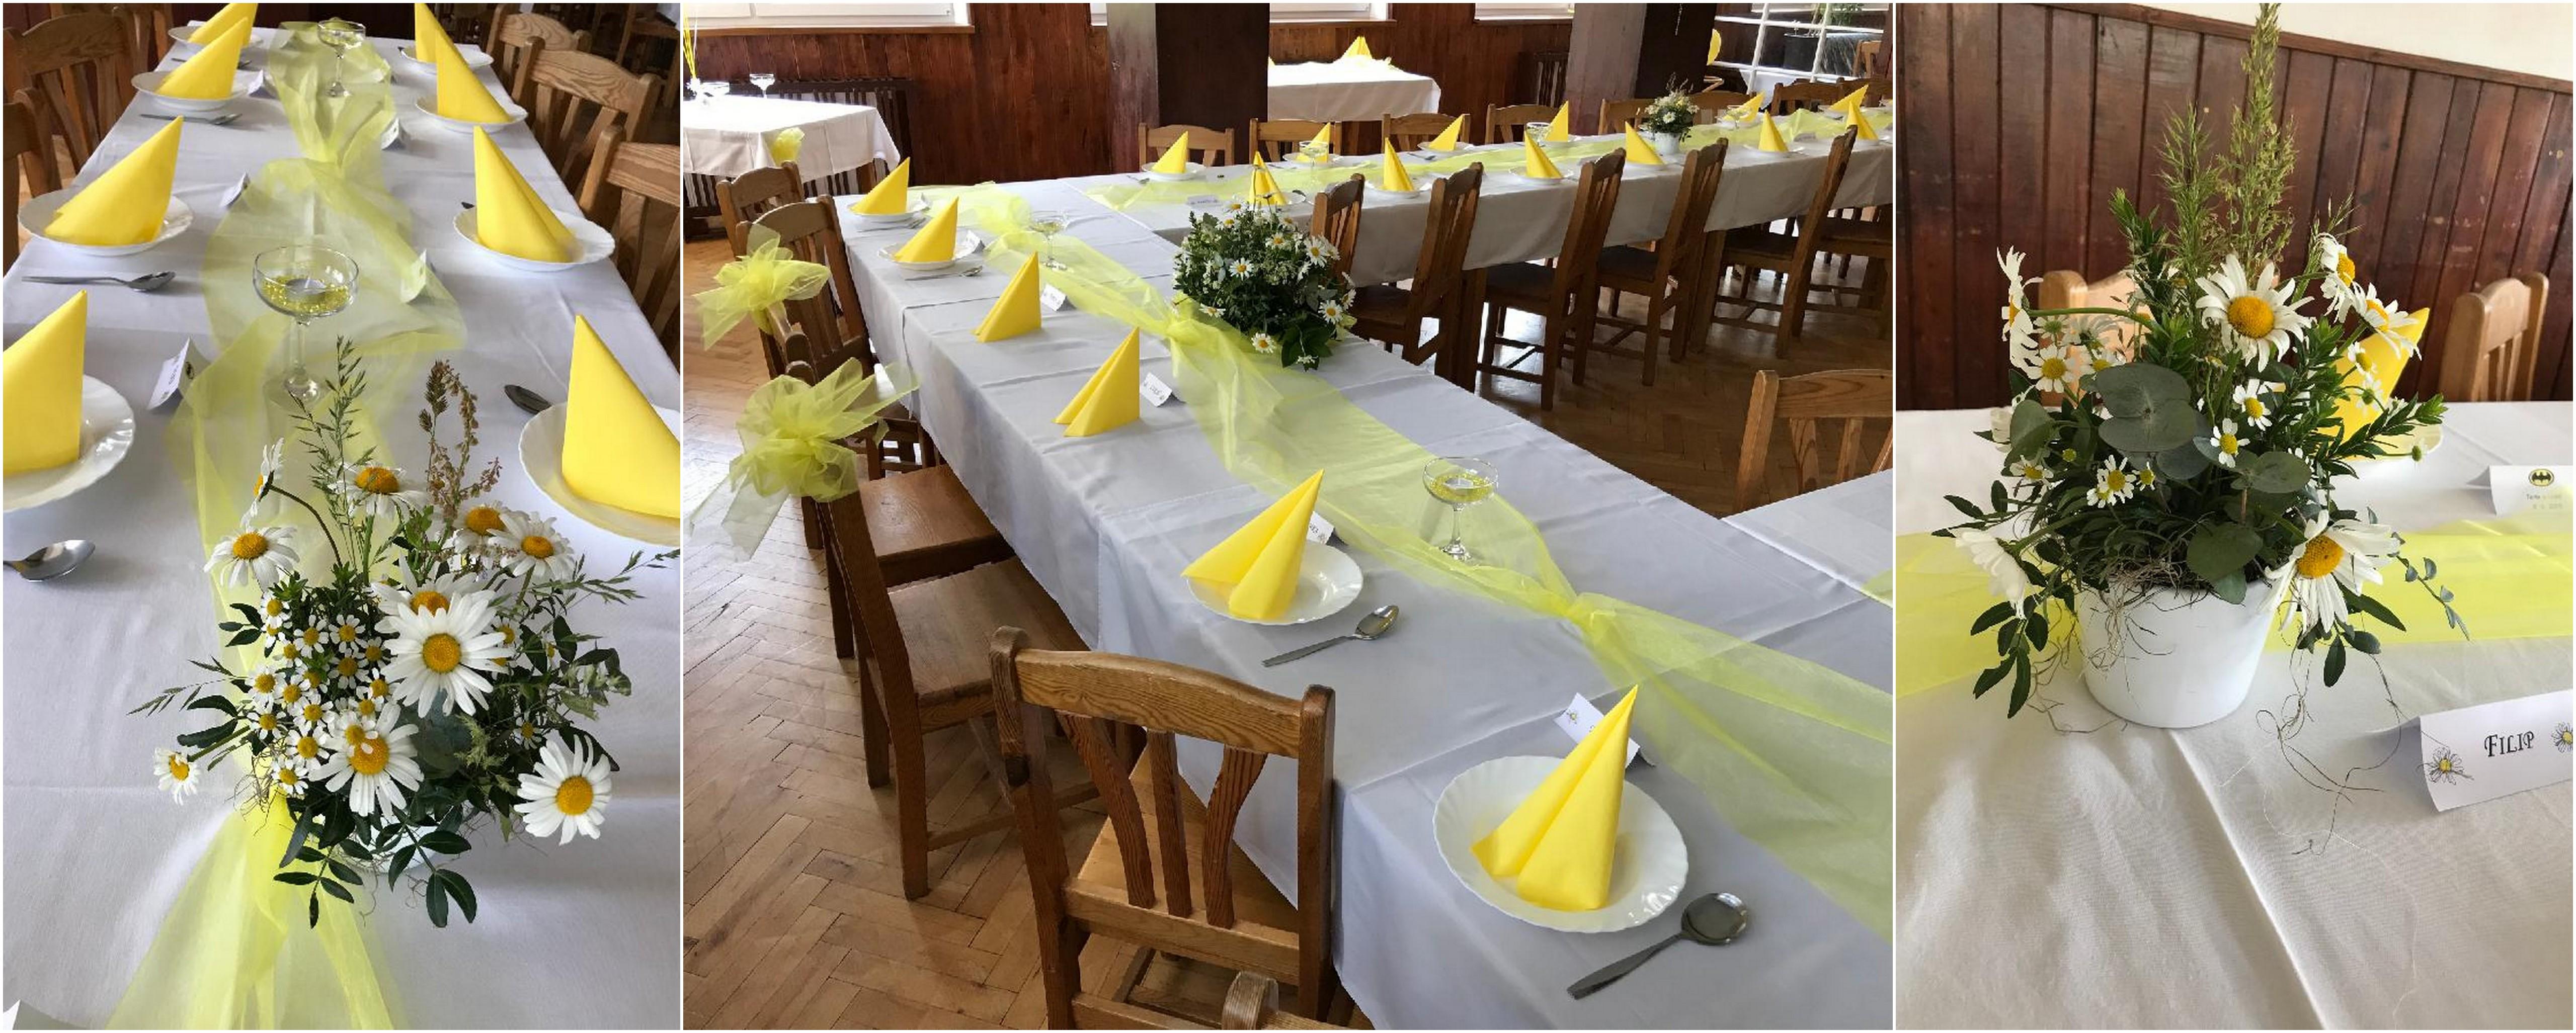 Svatba ve žlutém